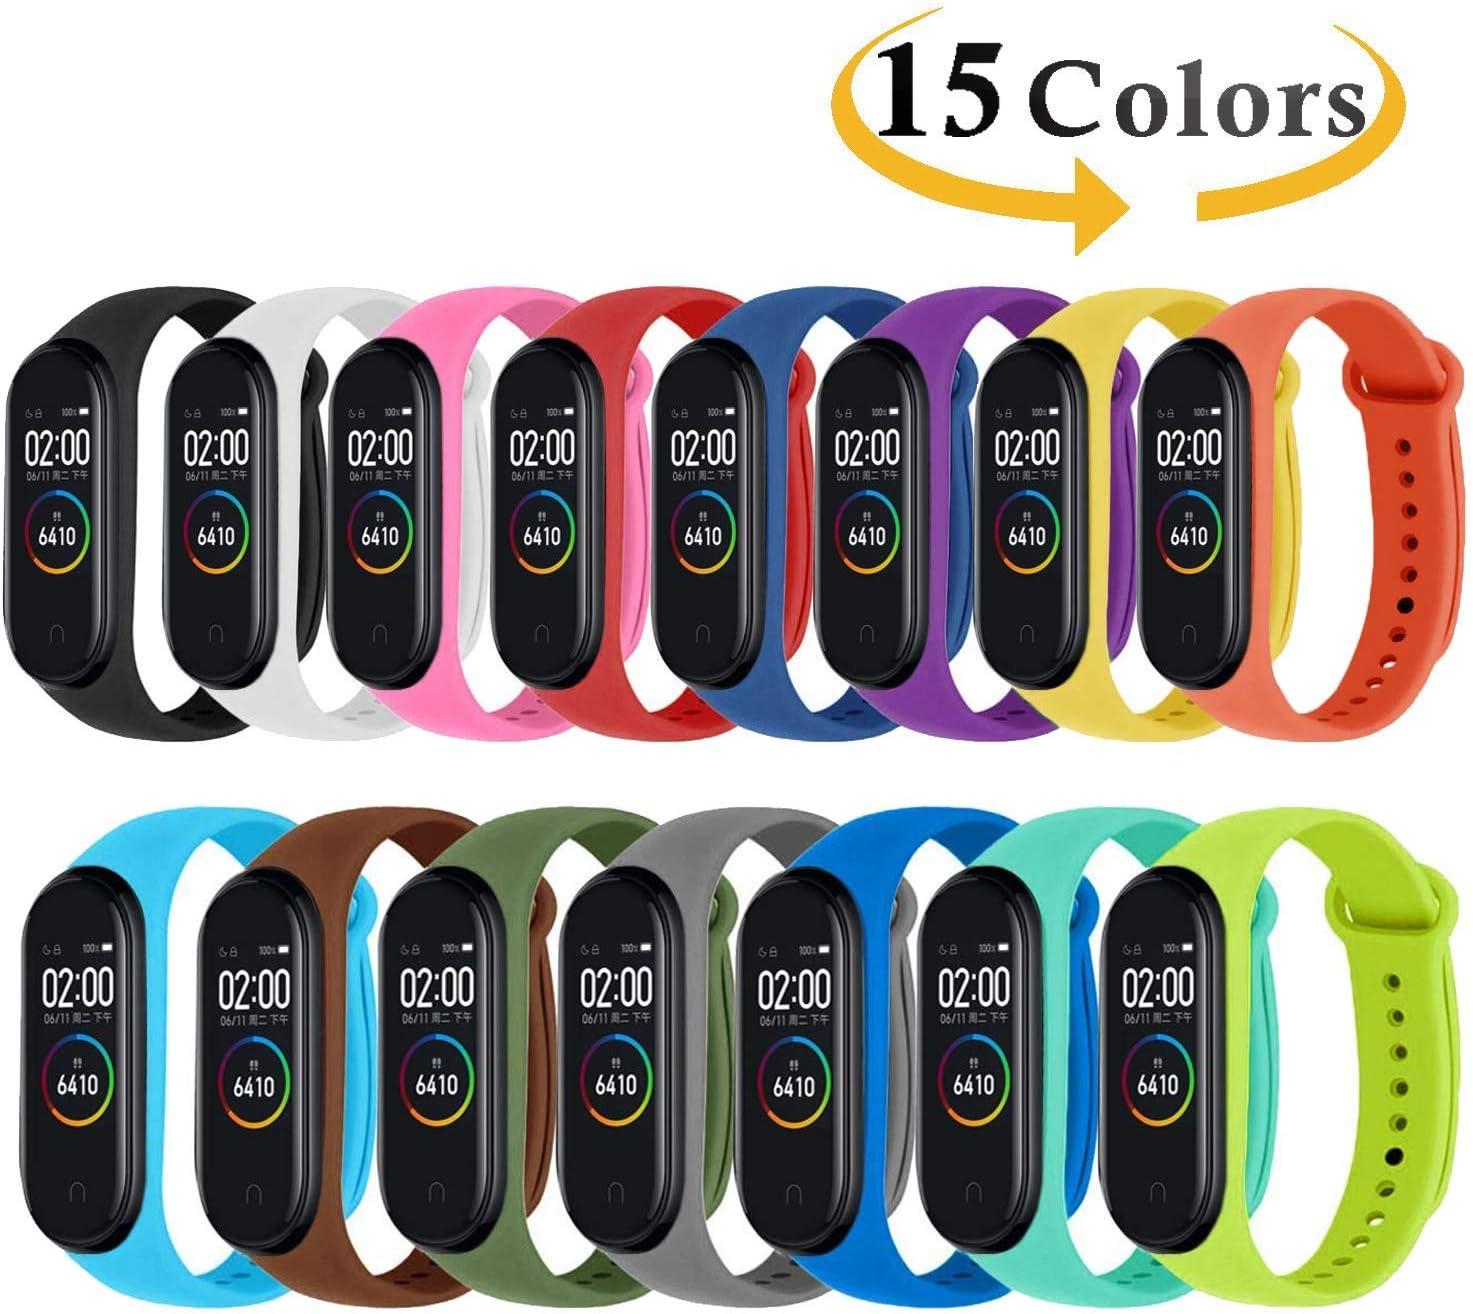 Monuary 15 Piezas Correa para Xiaomi Mi Smart Band 4 / Mi Band 3 Pulsera, Silicona Reloj de Recambio Brazalete Coloridos Correas para Xiaomi Mi Band 3/4 [Compatible con Mi Smart Band 4]